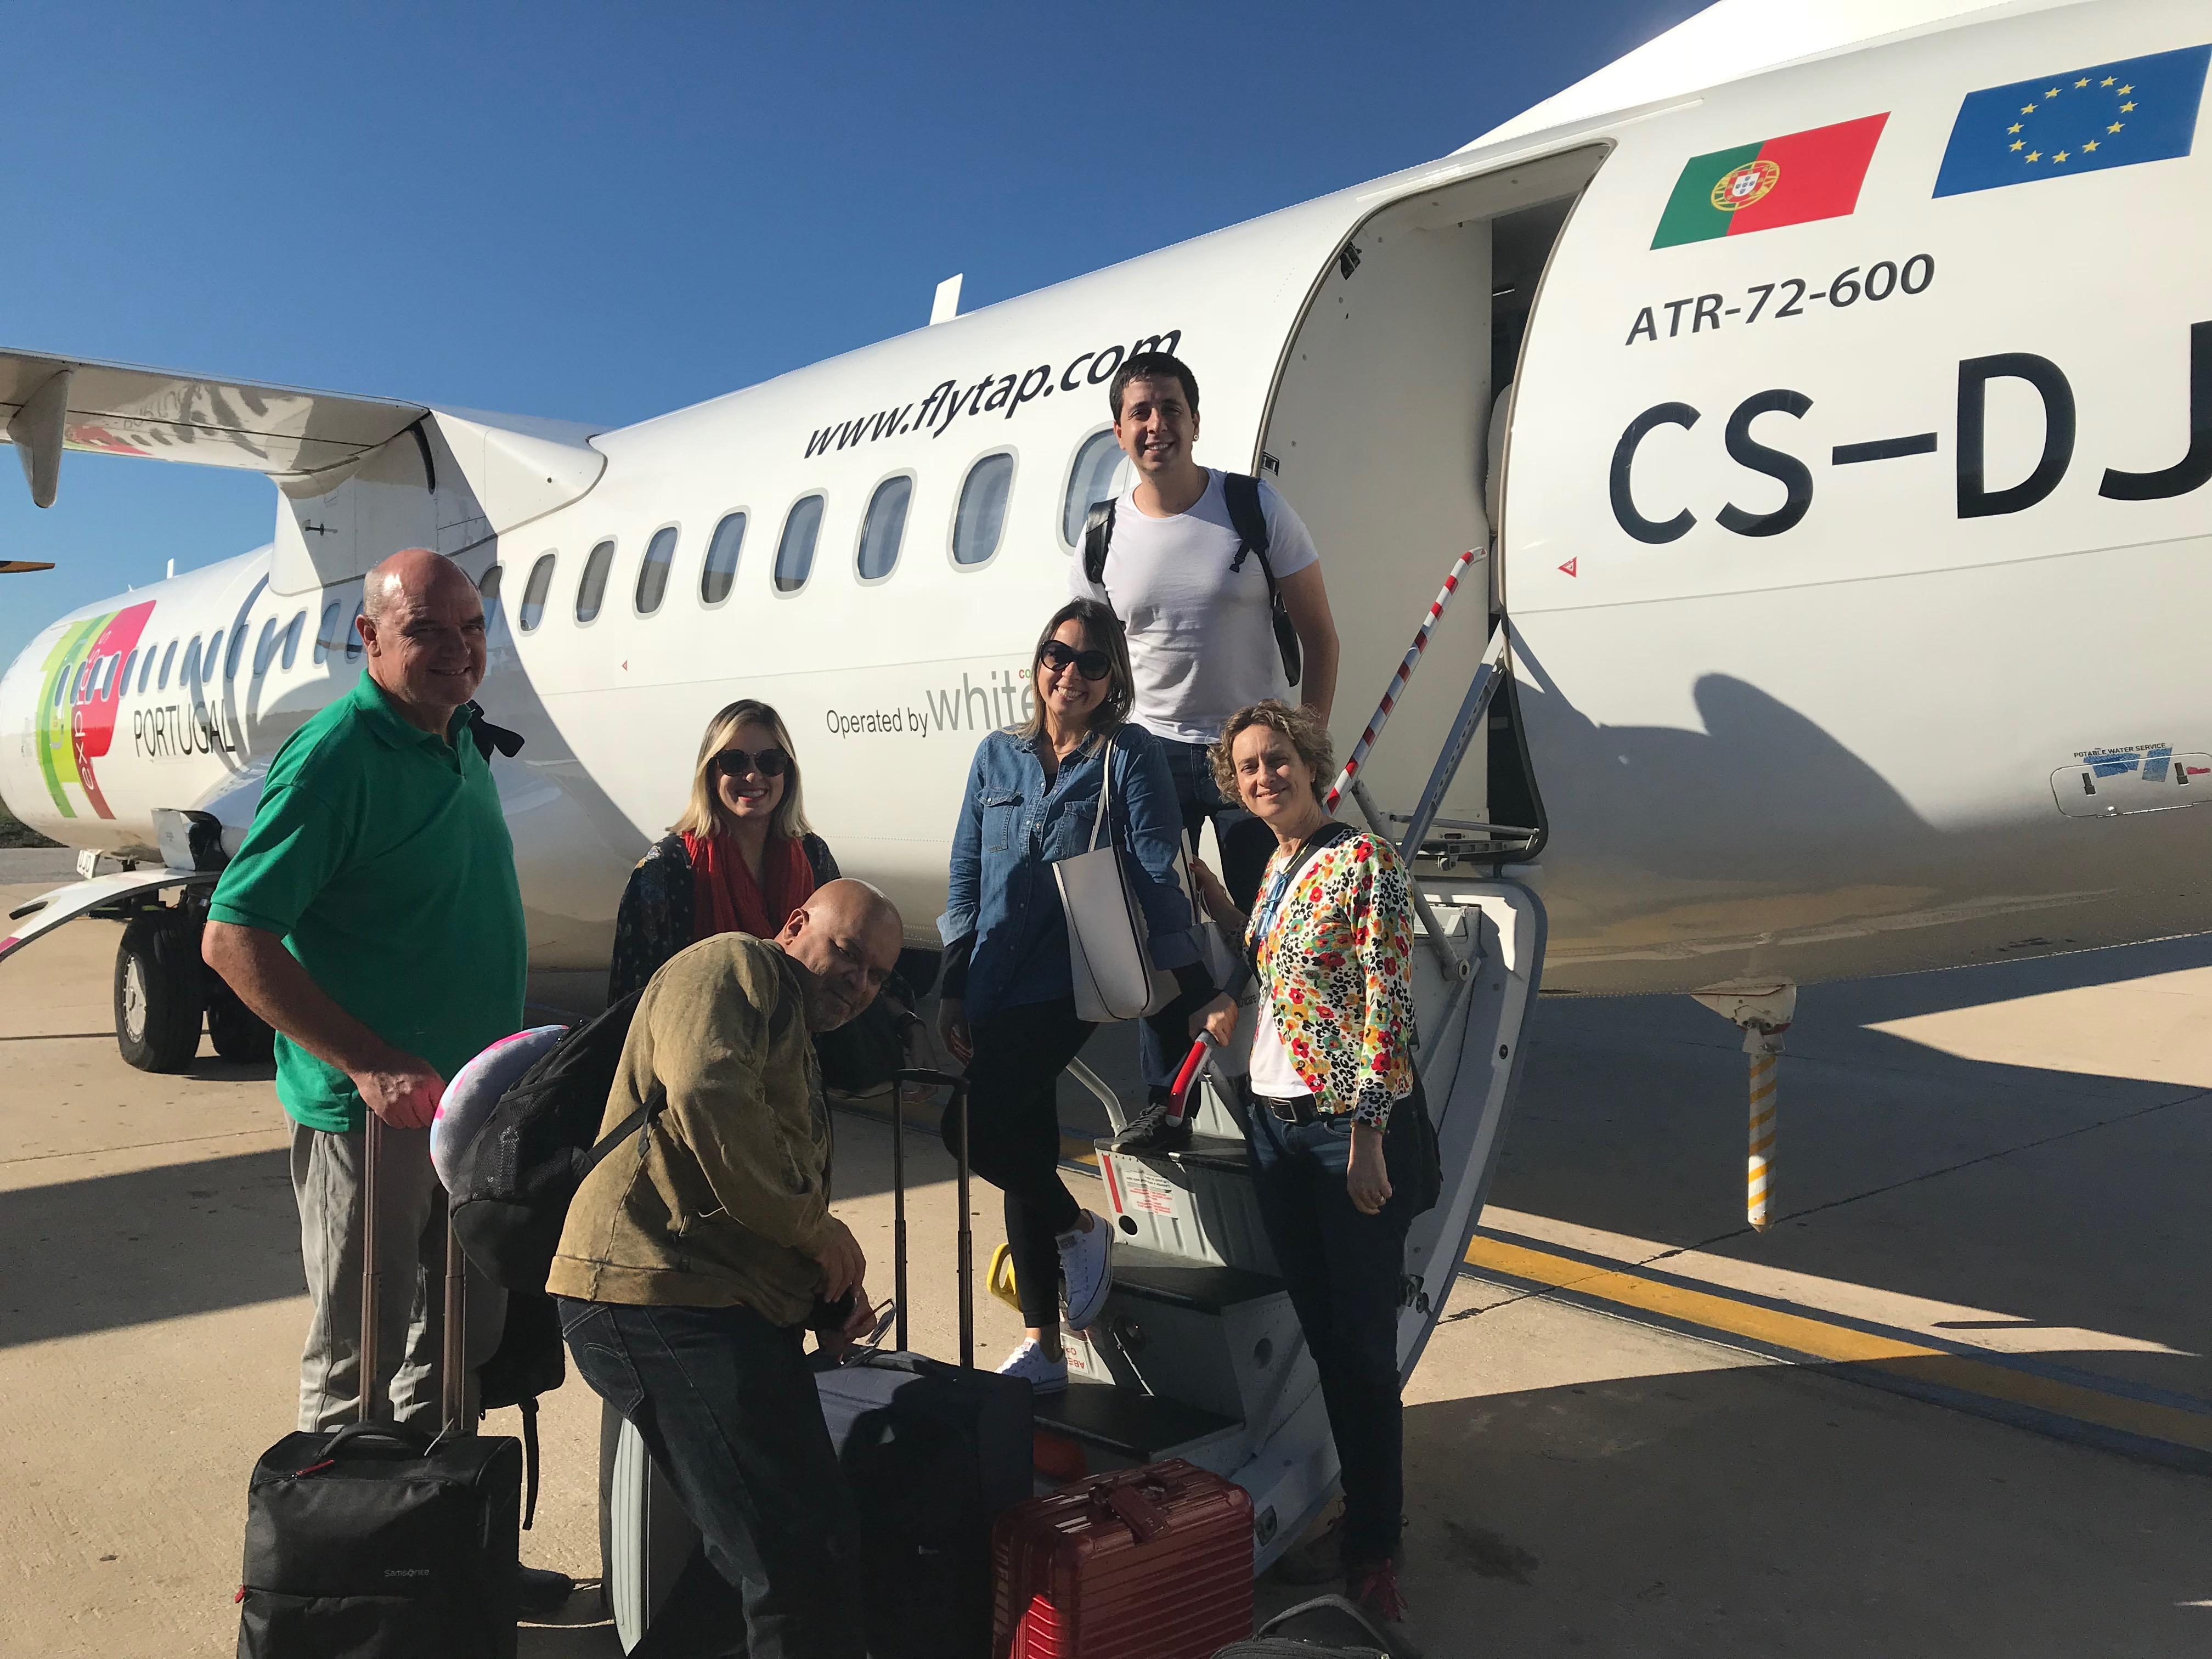 Maurício Walter, da Freeway; Camila Maciel, da Justtur; Sérgio Silva, da Flytour; Taylise Fernandes, da Hello Brazil; Sonia Werblowsky, da Immaginare, e Renan Santana, da Fanato, embarcam no voo da TAP, com destino a Marrakech